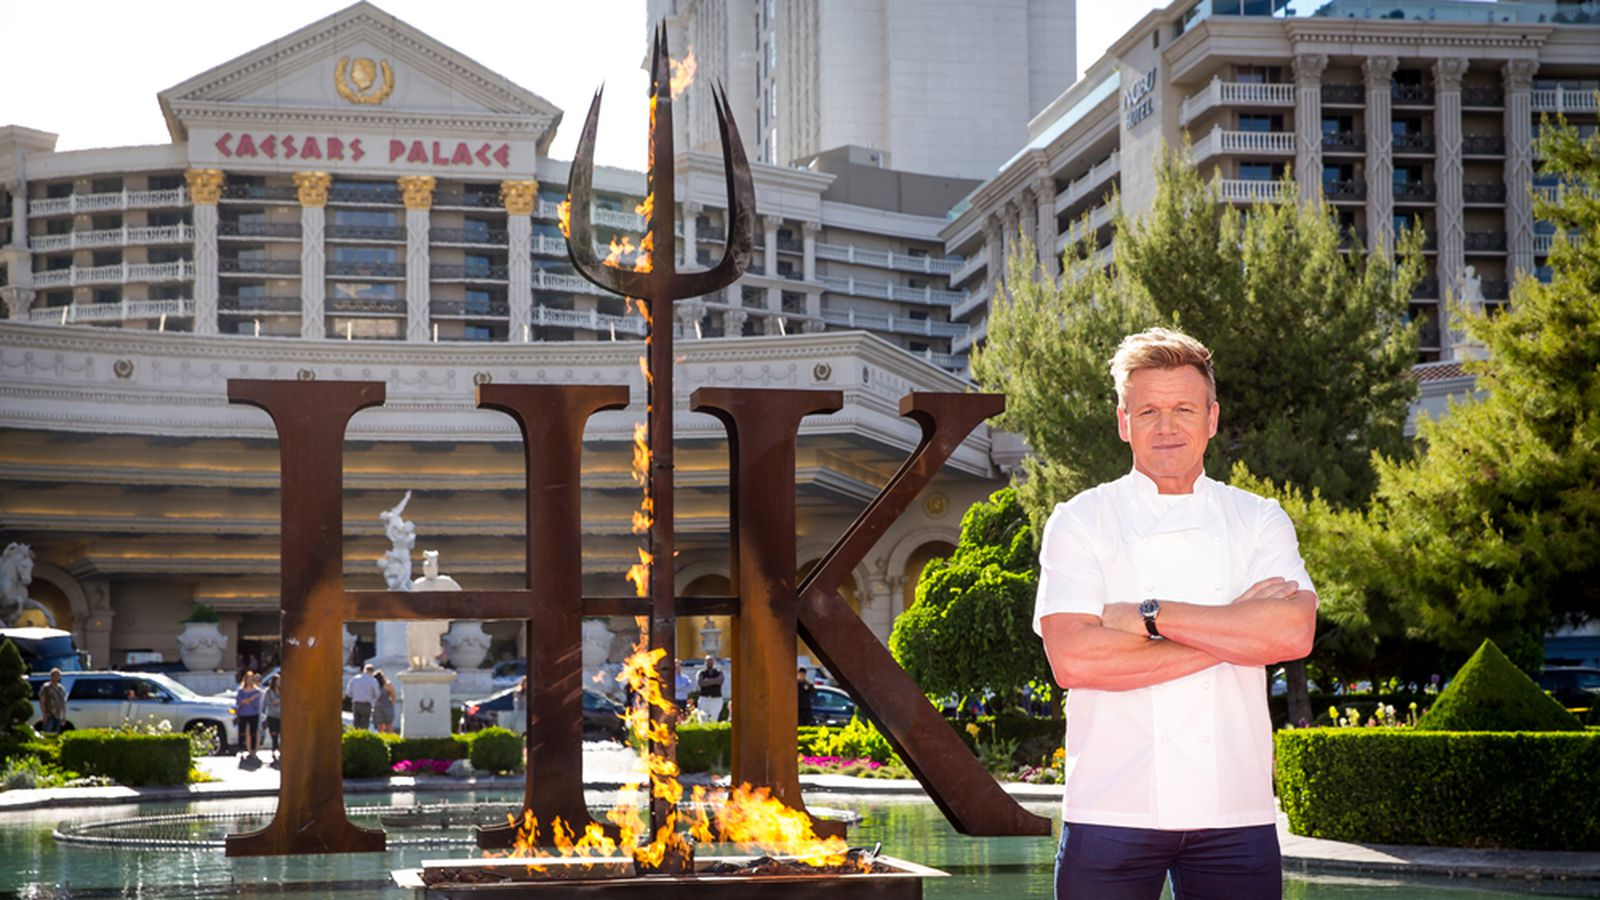 Hell S Kitchen Restaurant Los Angeles Gordon Ramsay